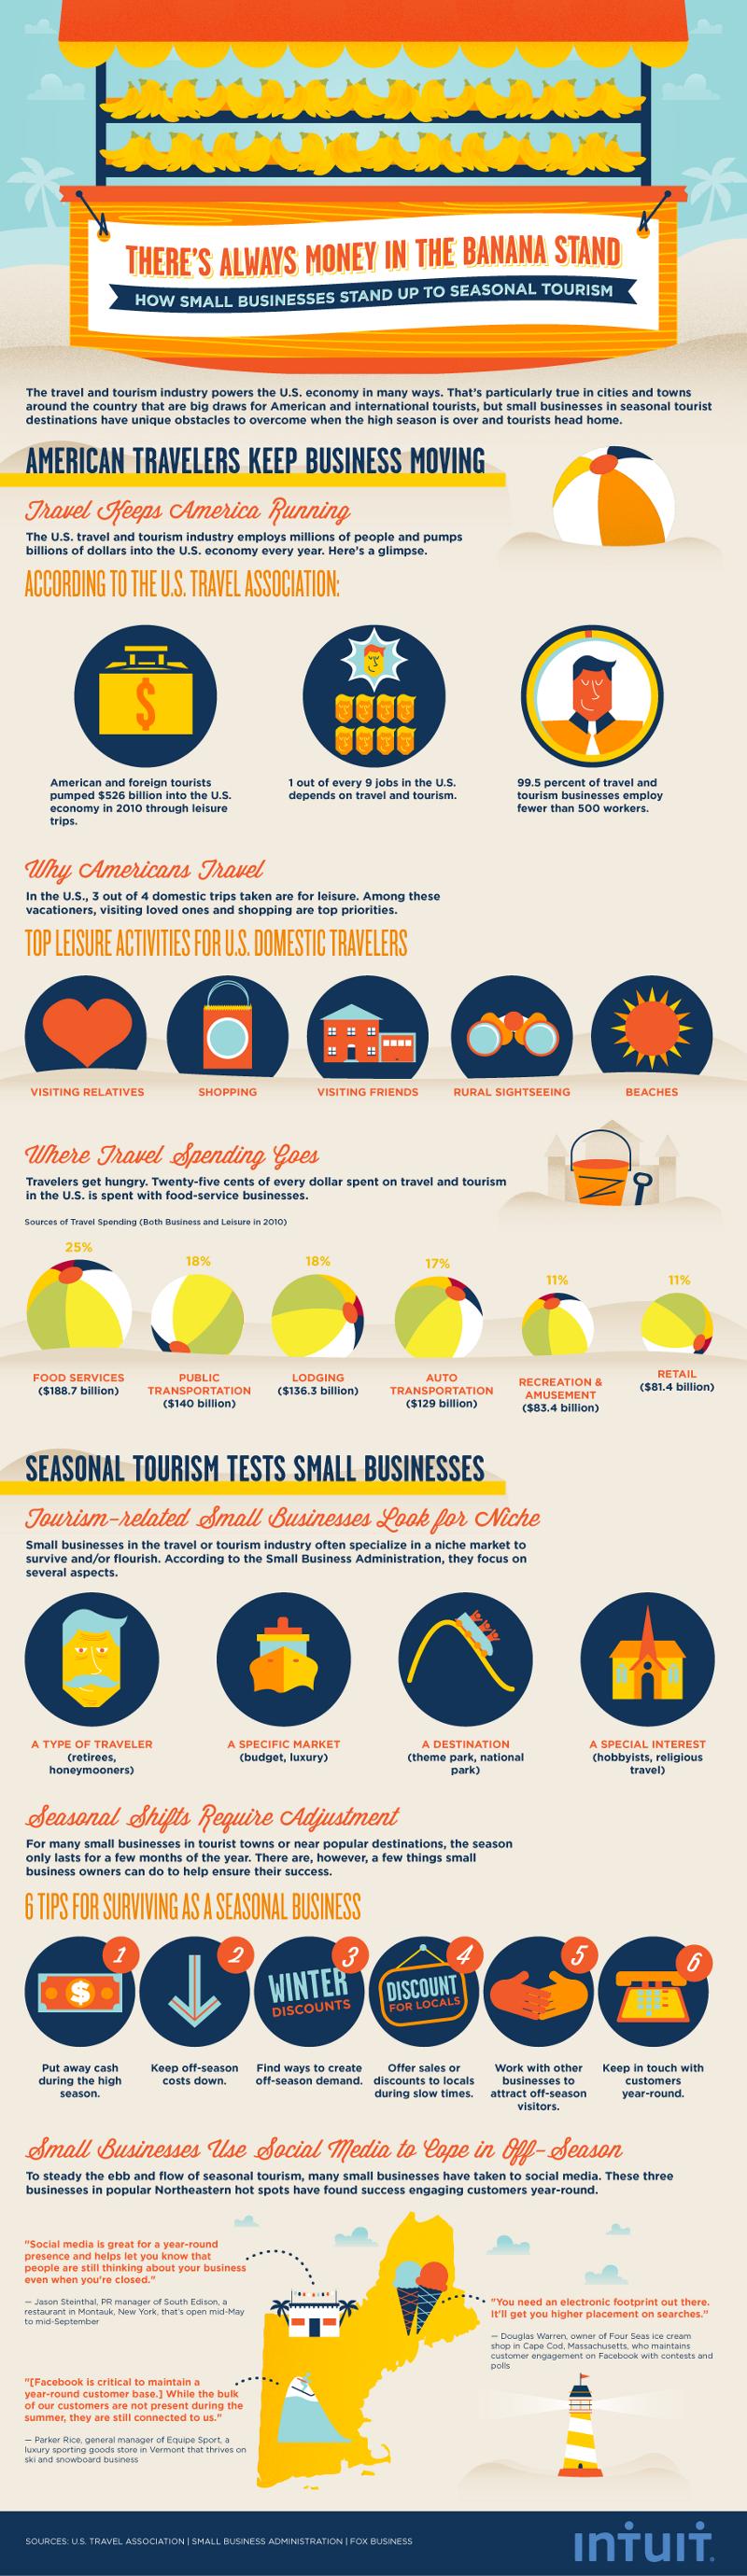 Tourism-Industry-Statistics